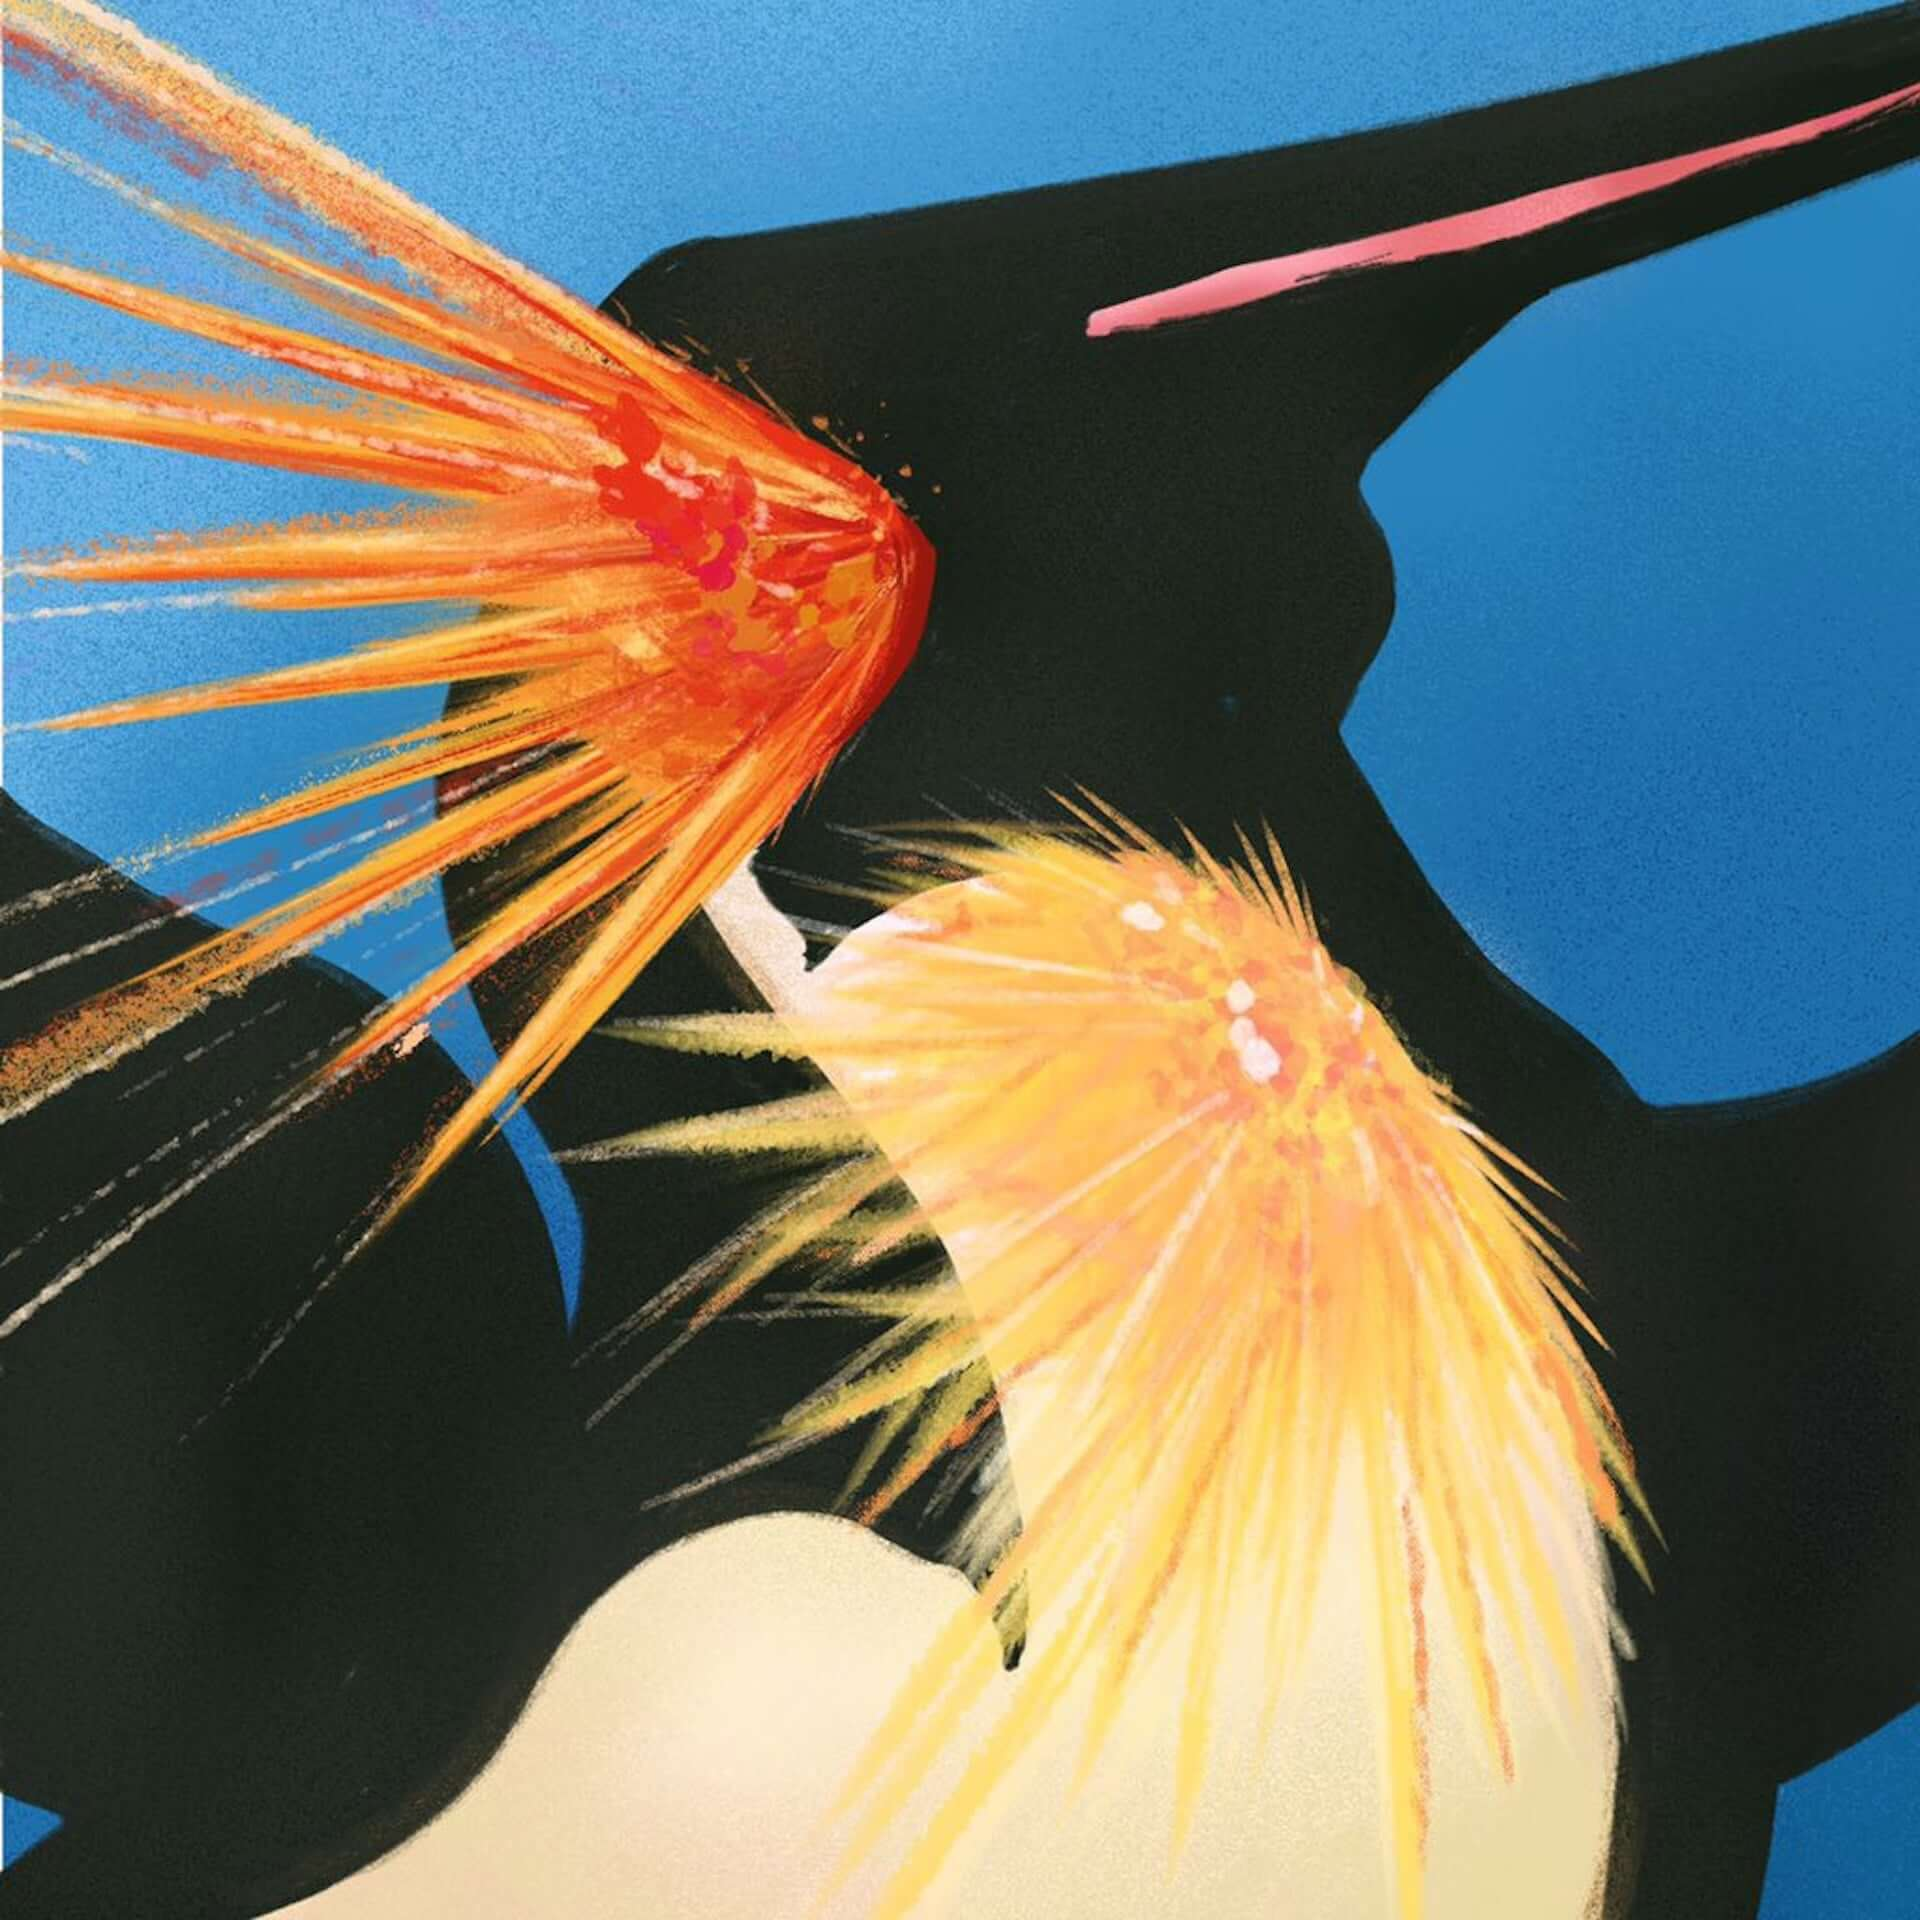 LIVEHAUSのライブ配信企画にSouth Penguinが出演決定|Helsinki Lambda Club・稲葉航大、Dos Monos・荘子itも客演で参加 music200601_south_penguin_1-1920x1920